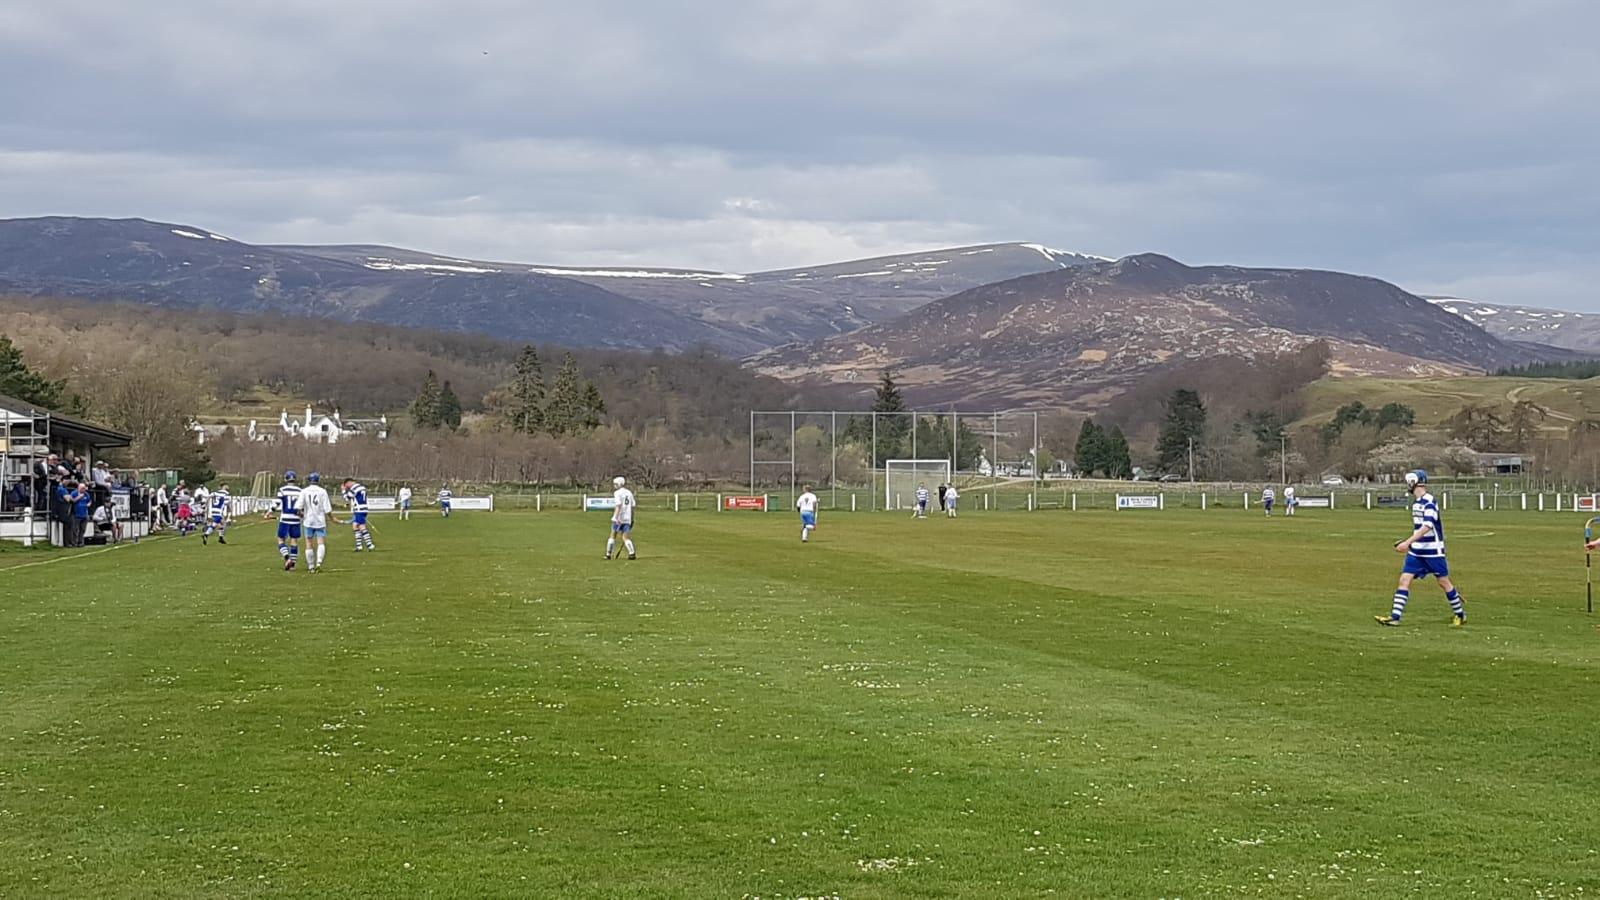 Newtonmore Shinty Pitch, Scottish Highlands